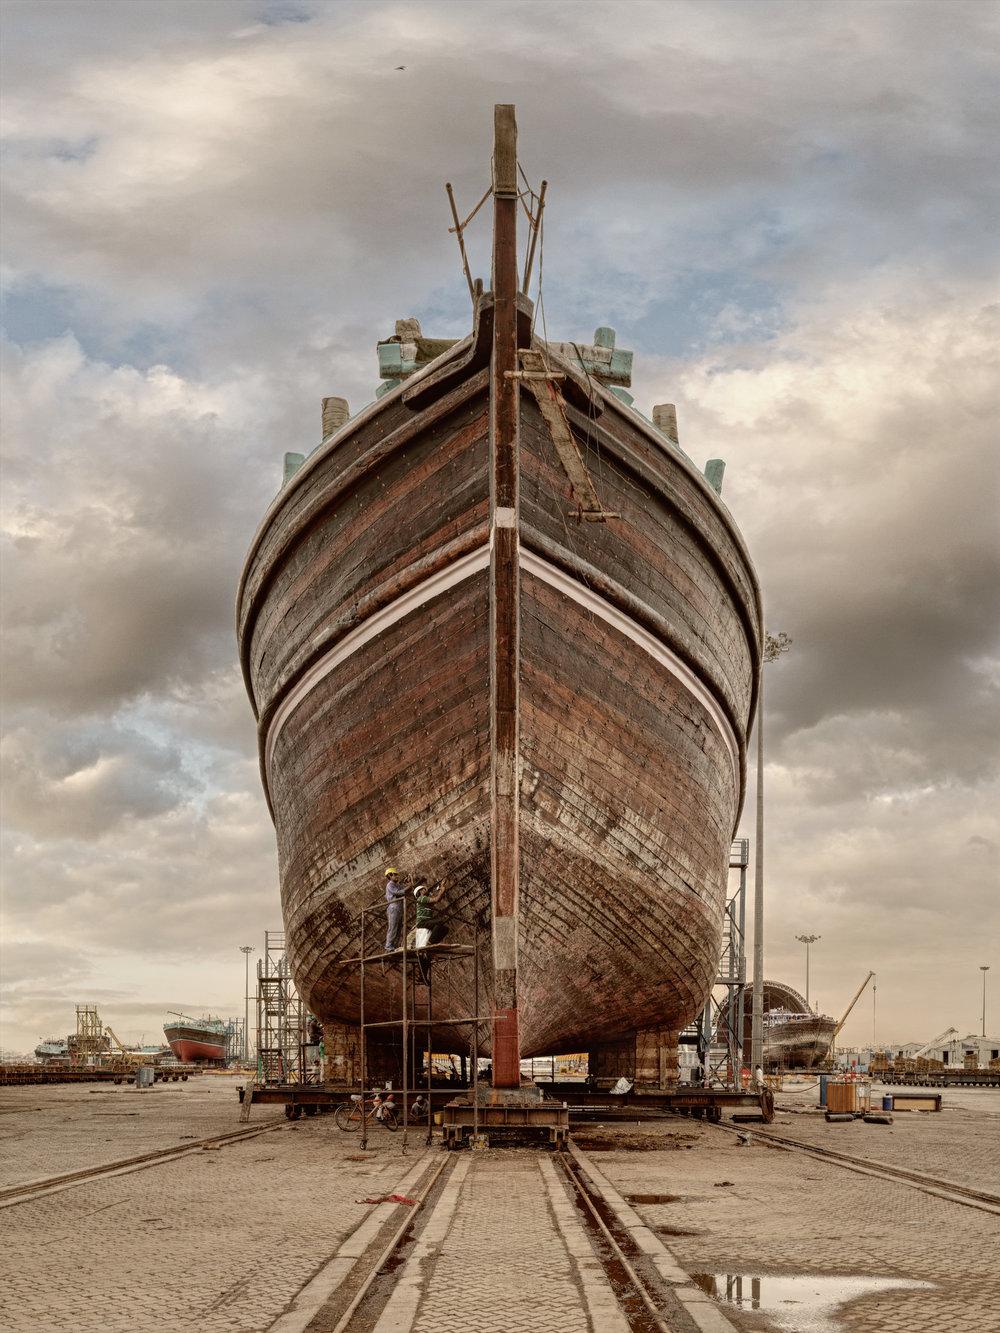 Ship I - Al Jaddaf Marine Dry Docks - Dubai 2017